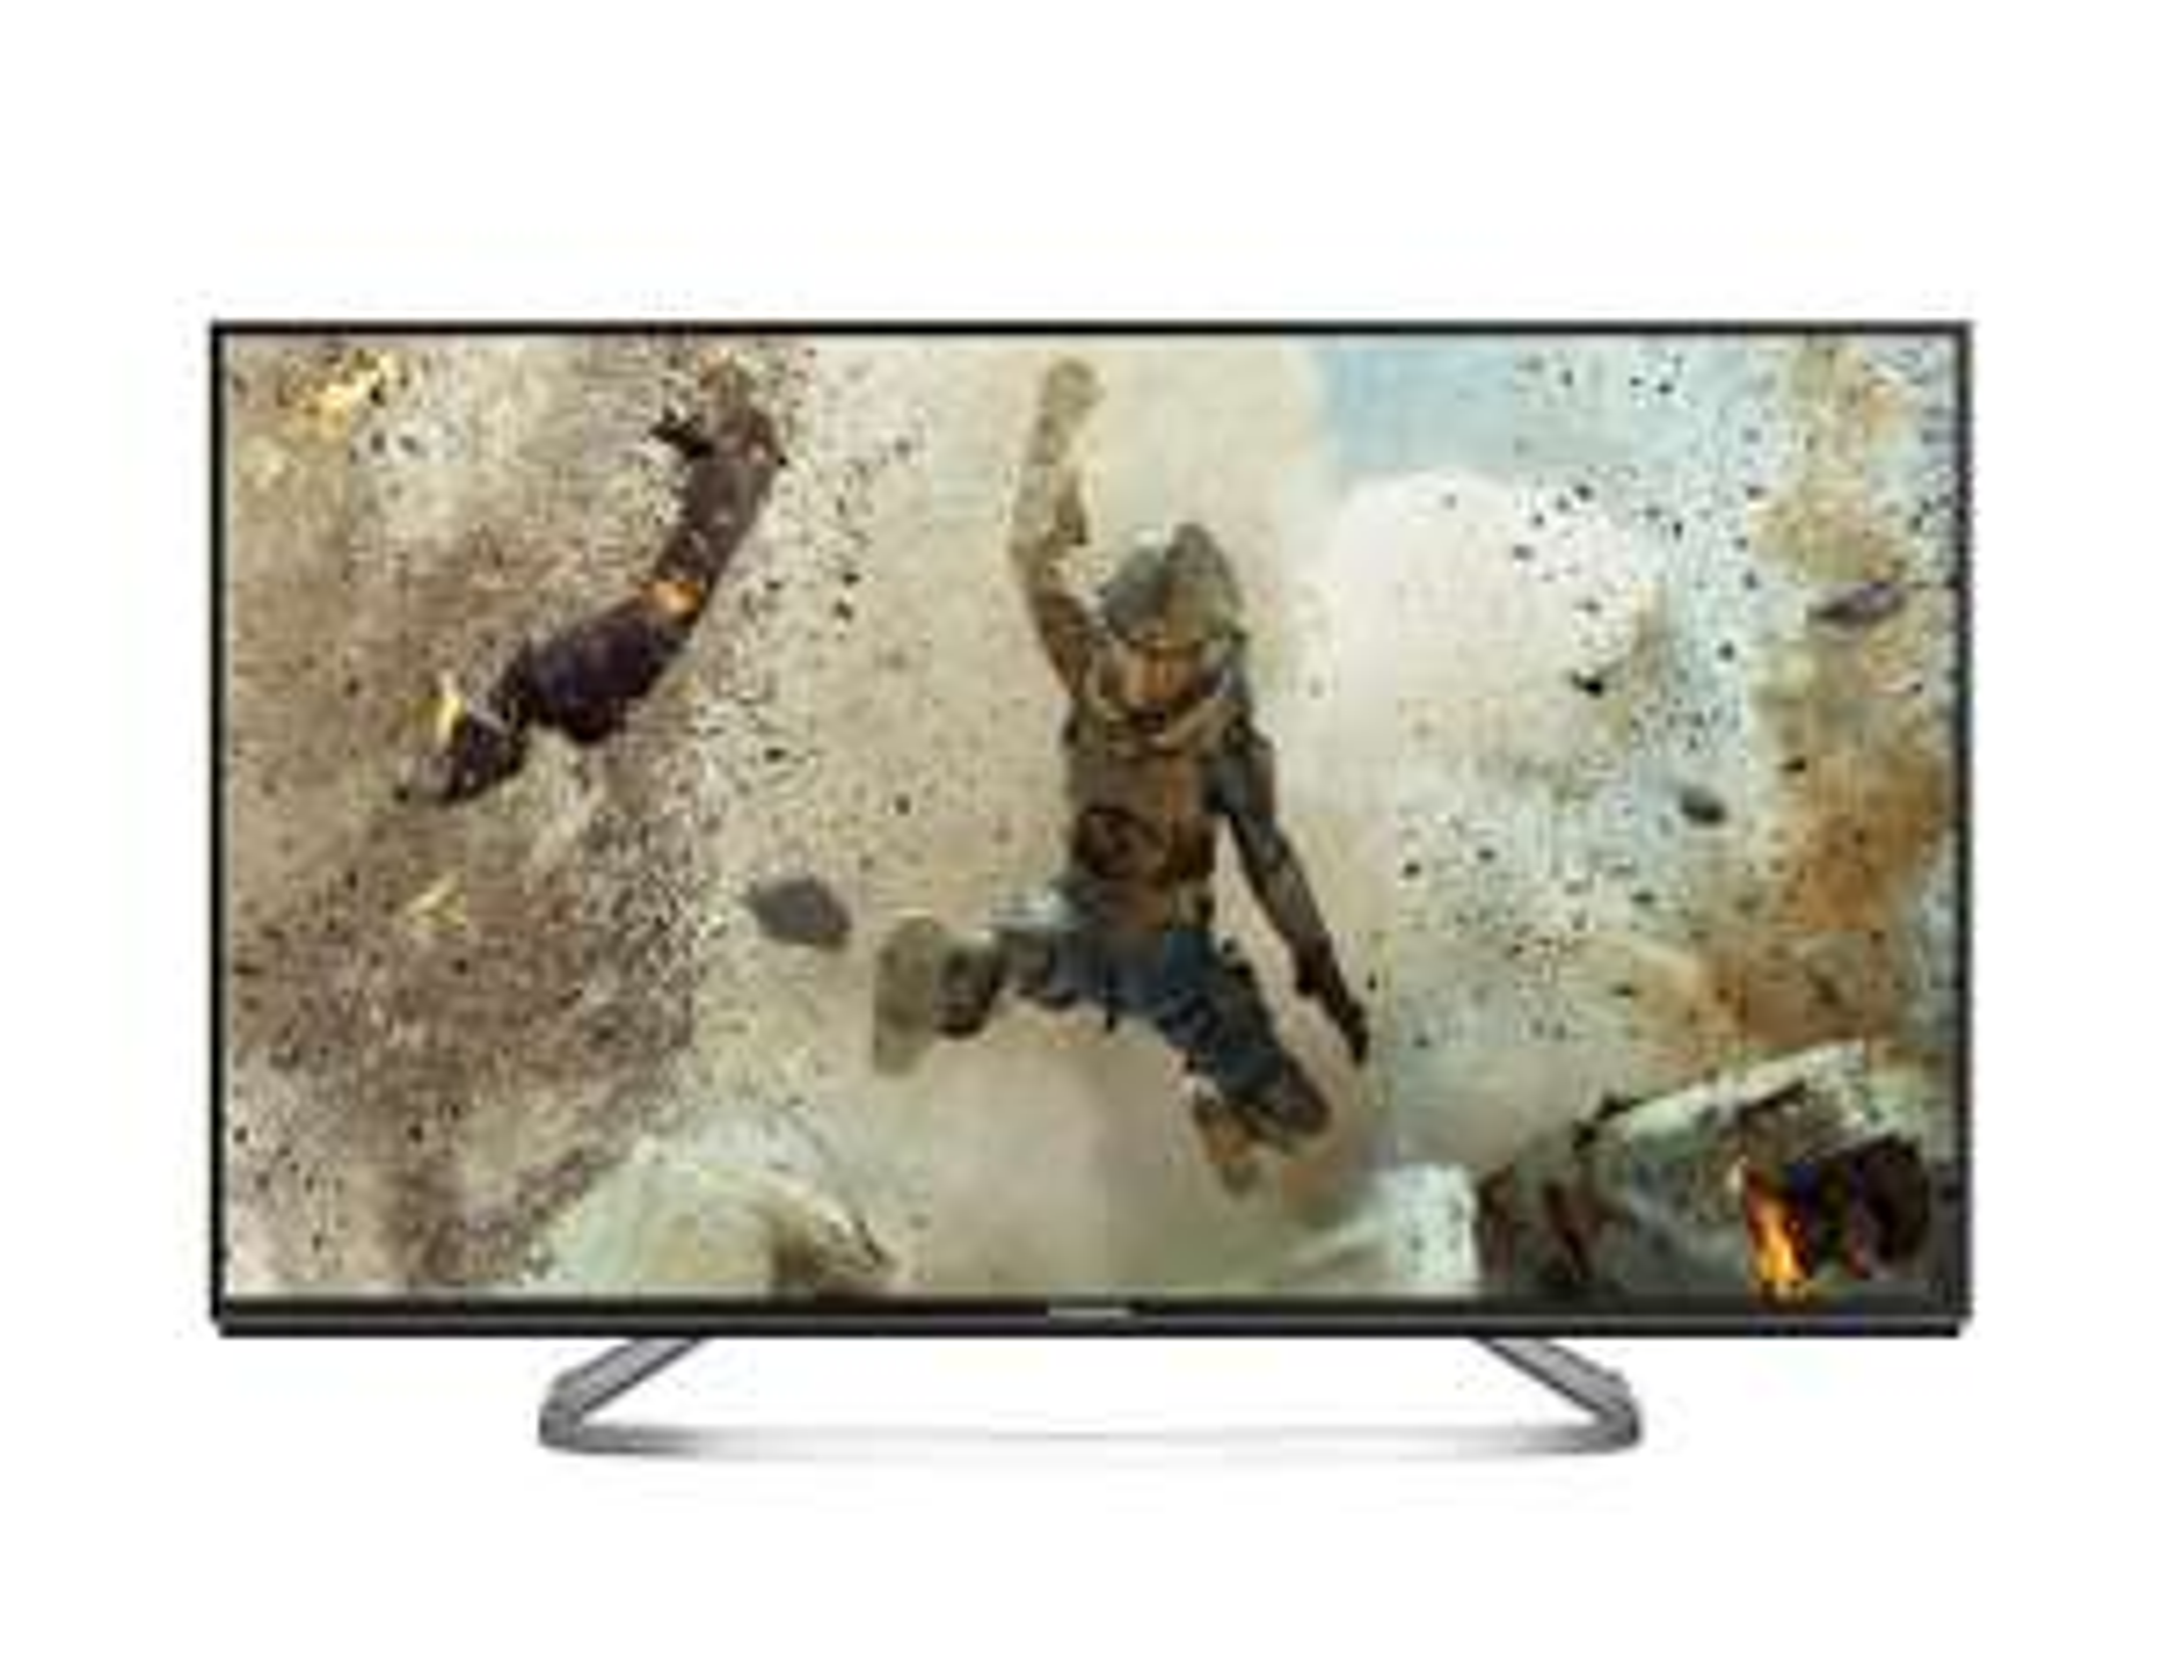 Panasonic TX-65FXN688 65 Zoll Fernseher (4K Ultra HD, HDR, Quattro Tuner, Smart-TV, Metallgehäuse)